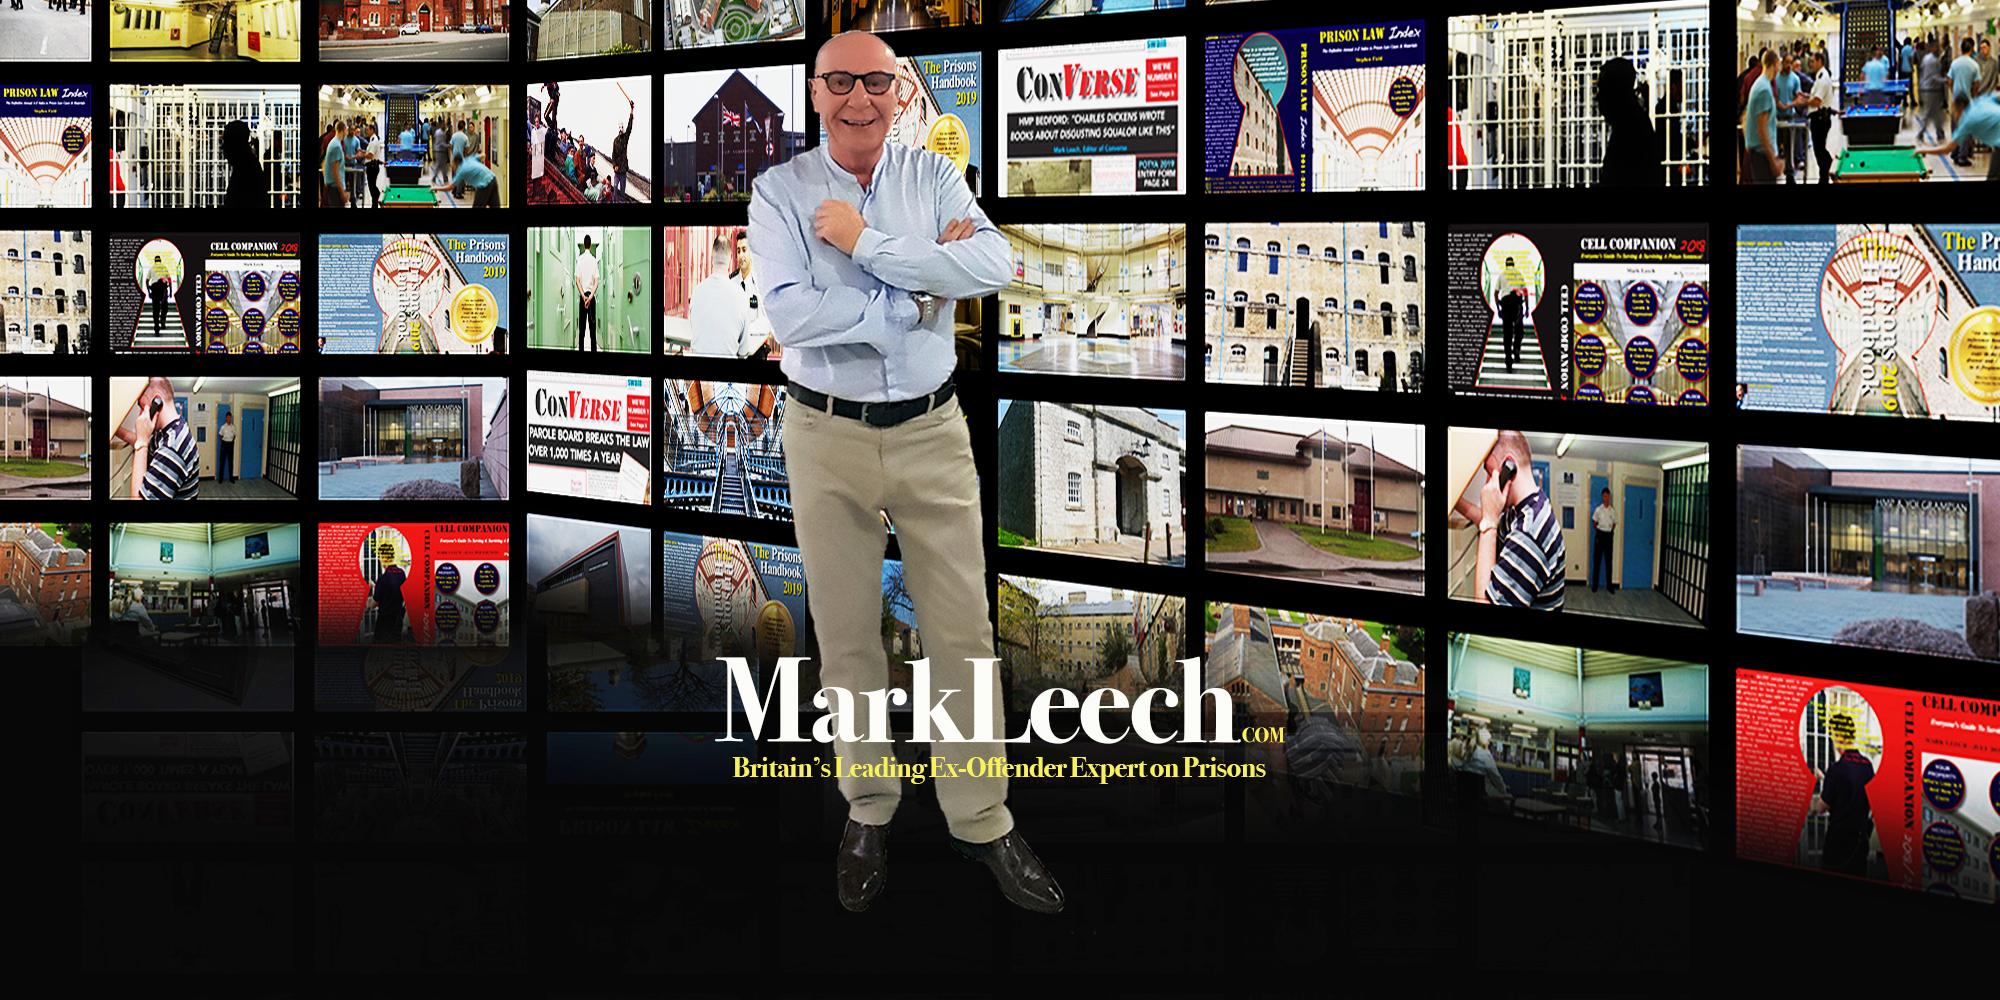 Mark Leech